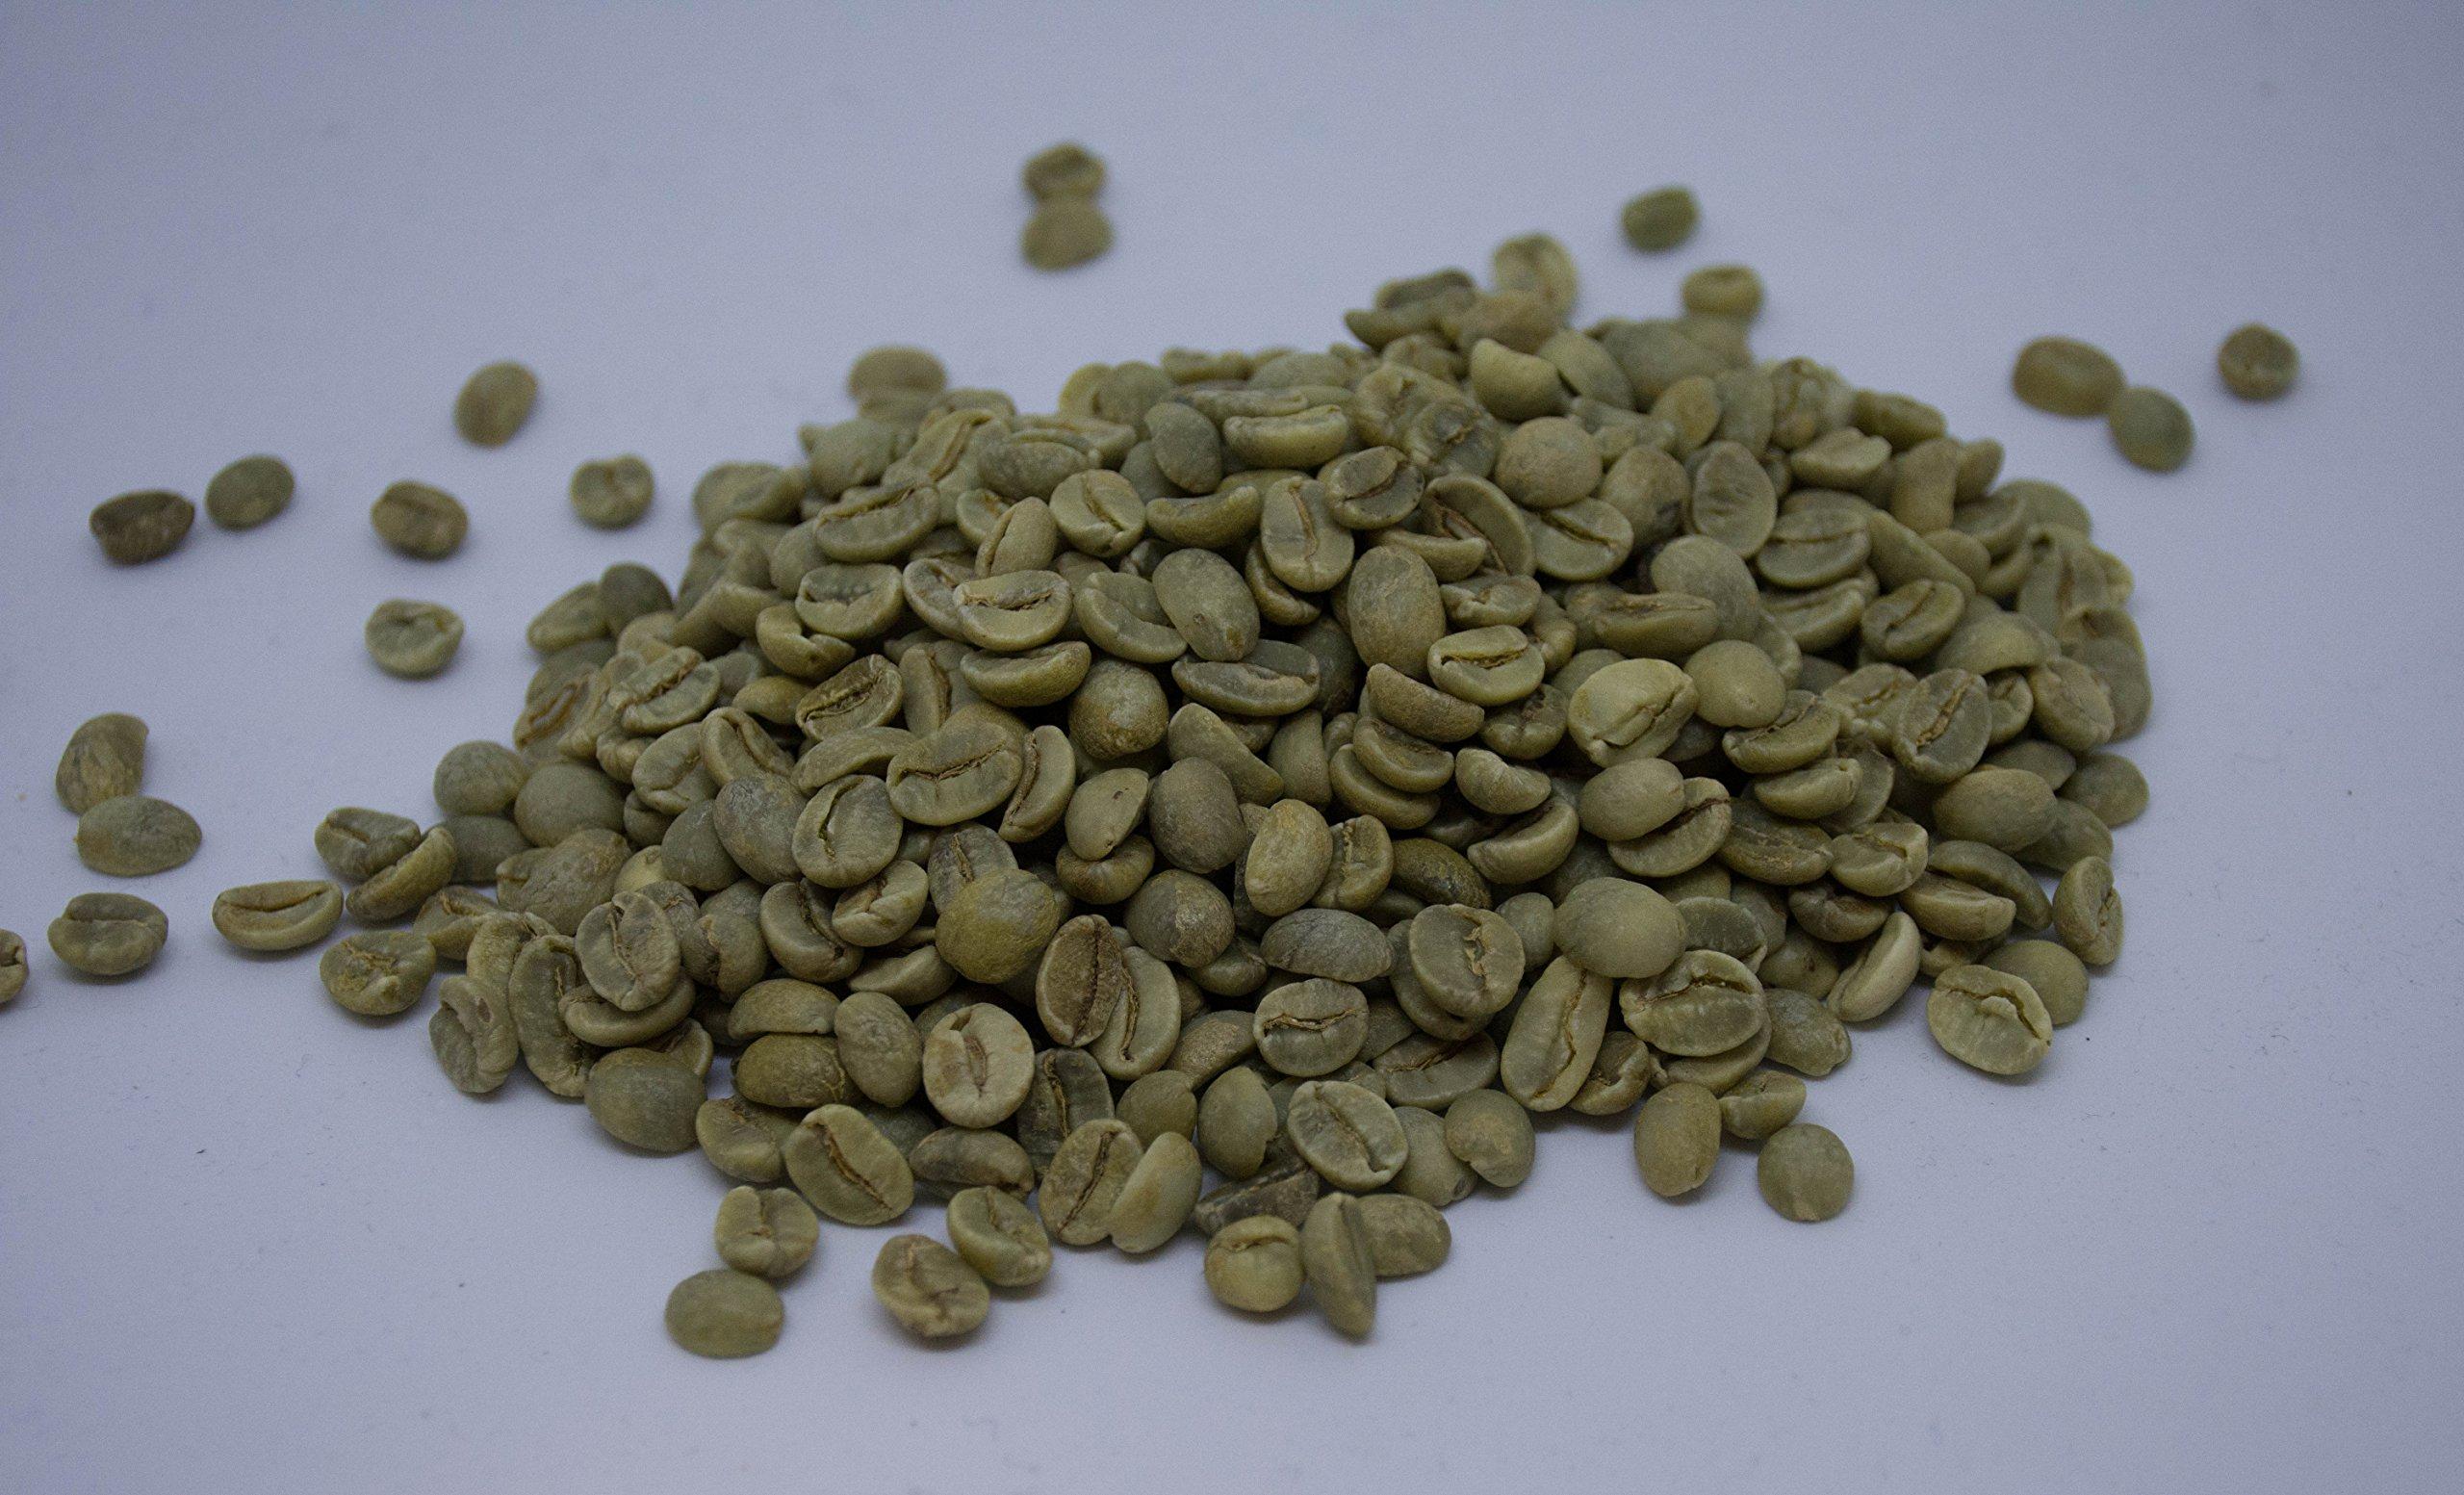 Law Coffee Green Coffee Beans -Sumatra Mandheling (5 lb)